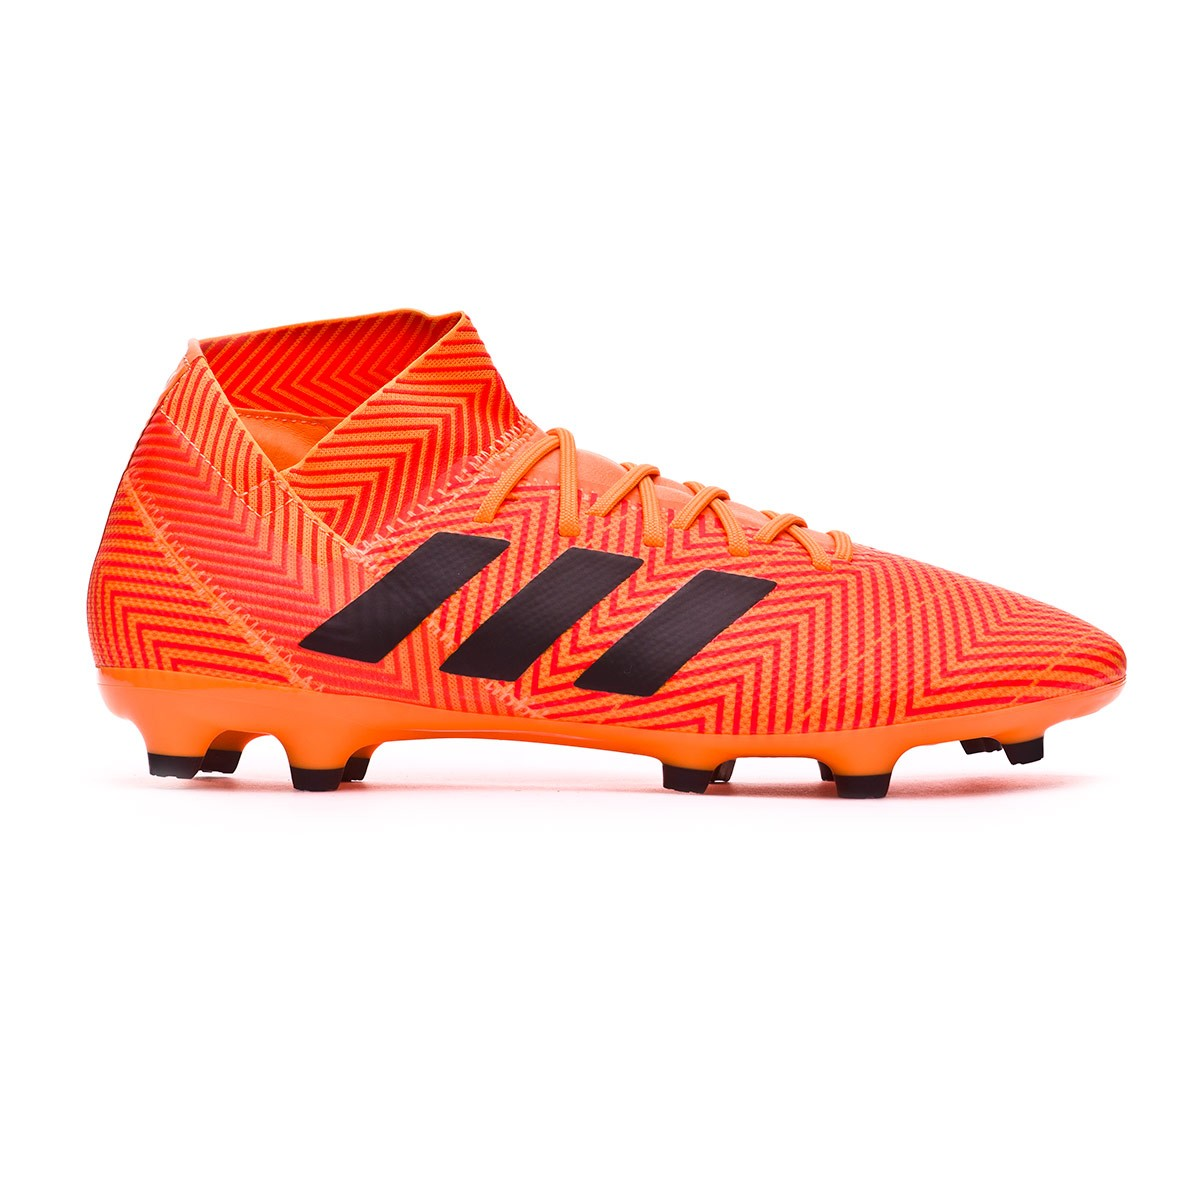 8a732b19f99ba Chuteira adidas Nemeziz 18.3 FG Zest-Black-Solar red - Loja de futebol  Fútbol Emotion